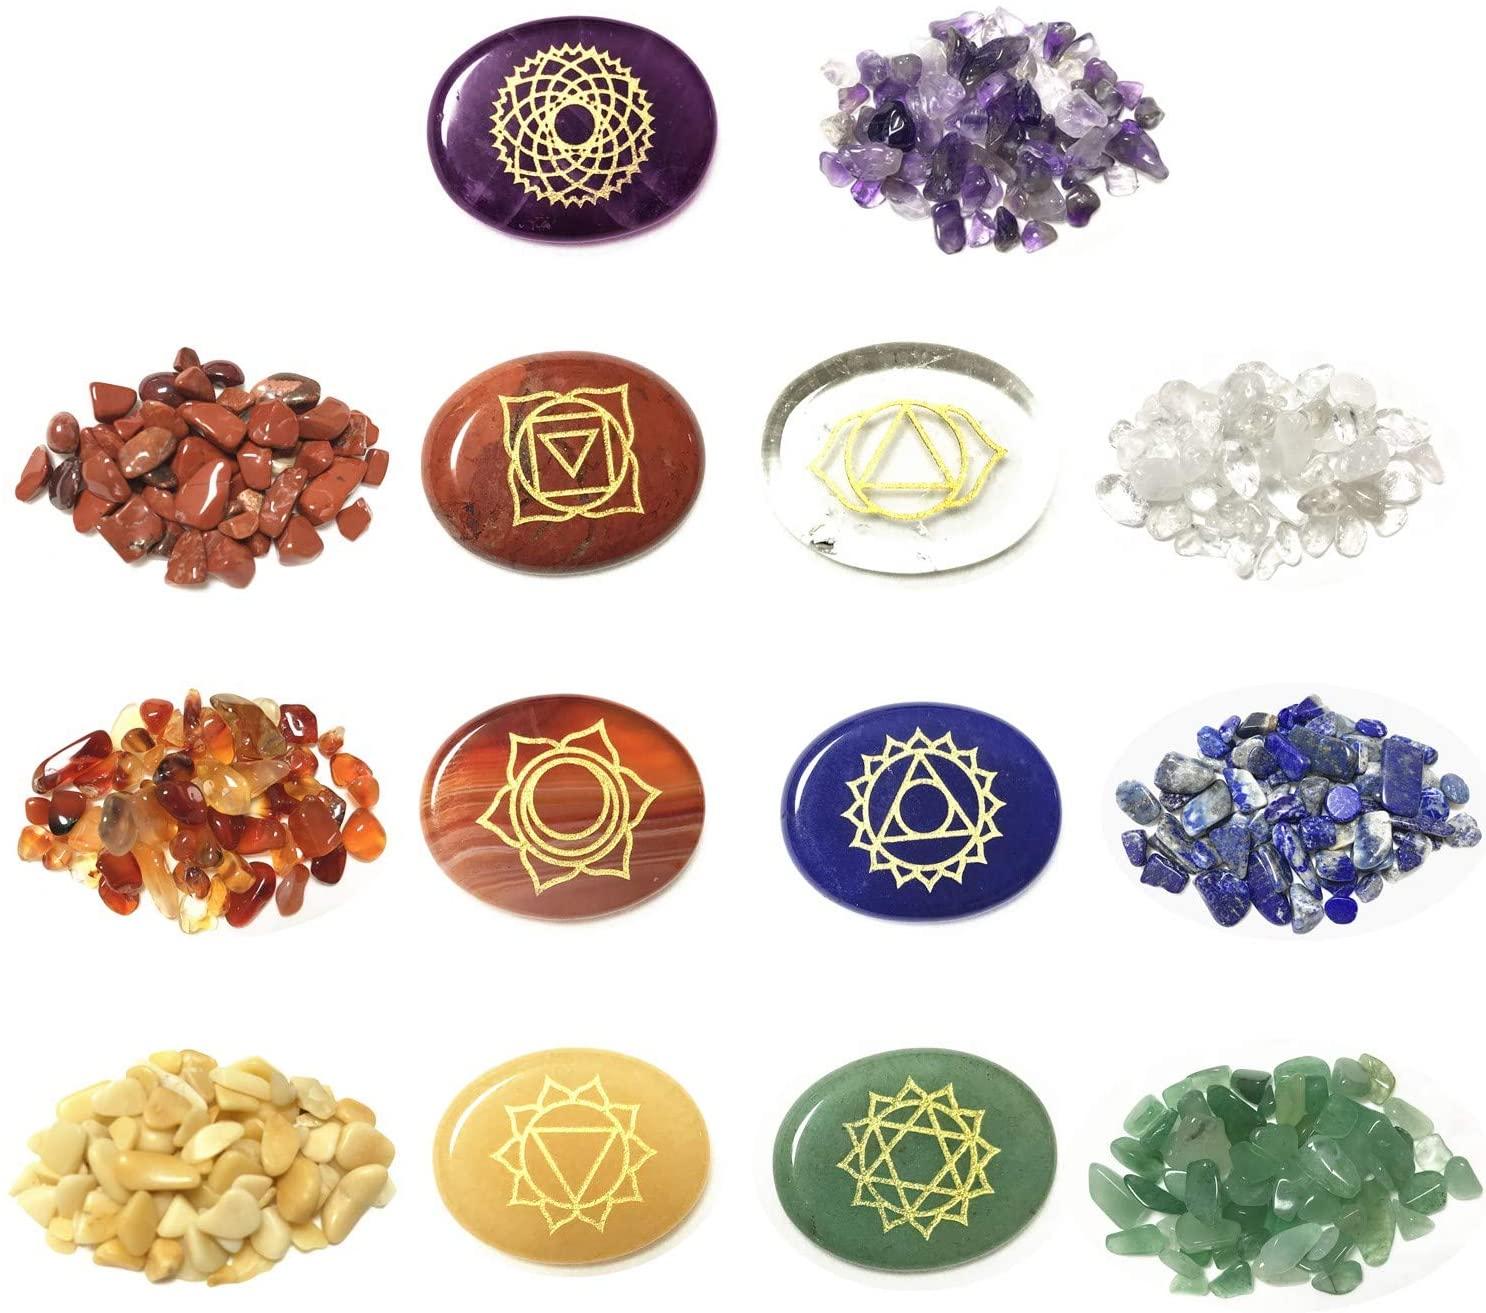 7 Chakra Gemstones Set 7 Chakra Chip Stones Reiki Healing Crystals with Engraved Chakra Symbols for EMF Protection and Spiritual Healing (Oval)